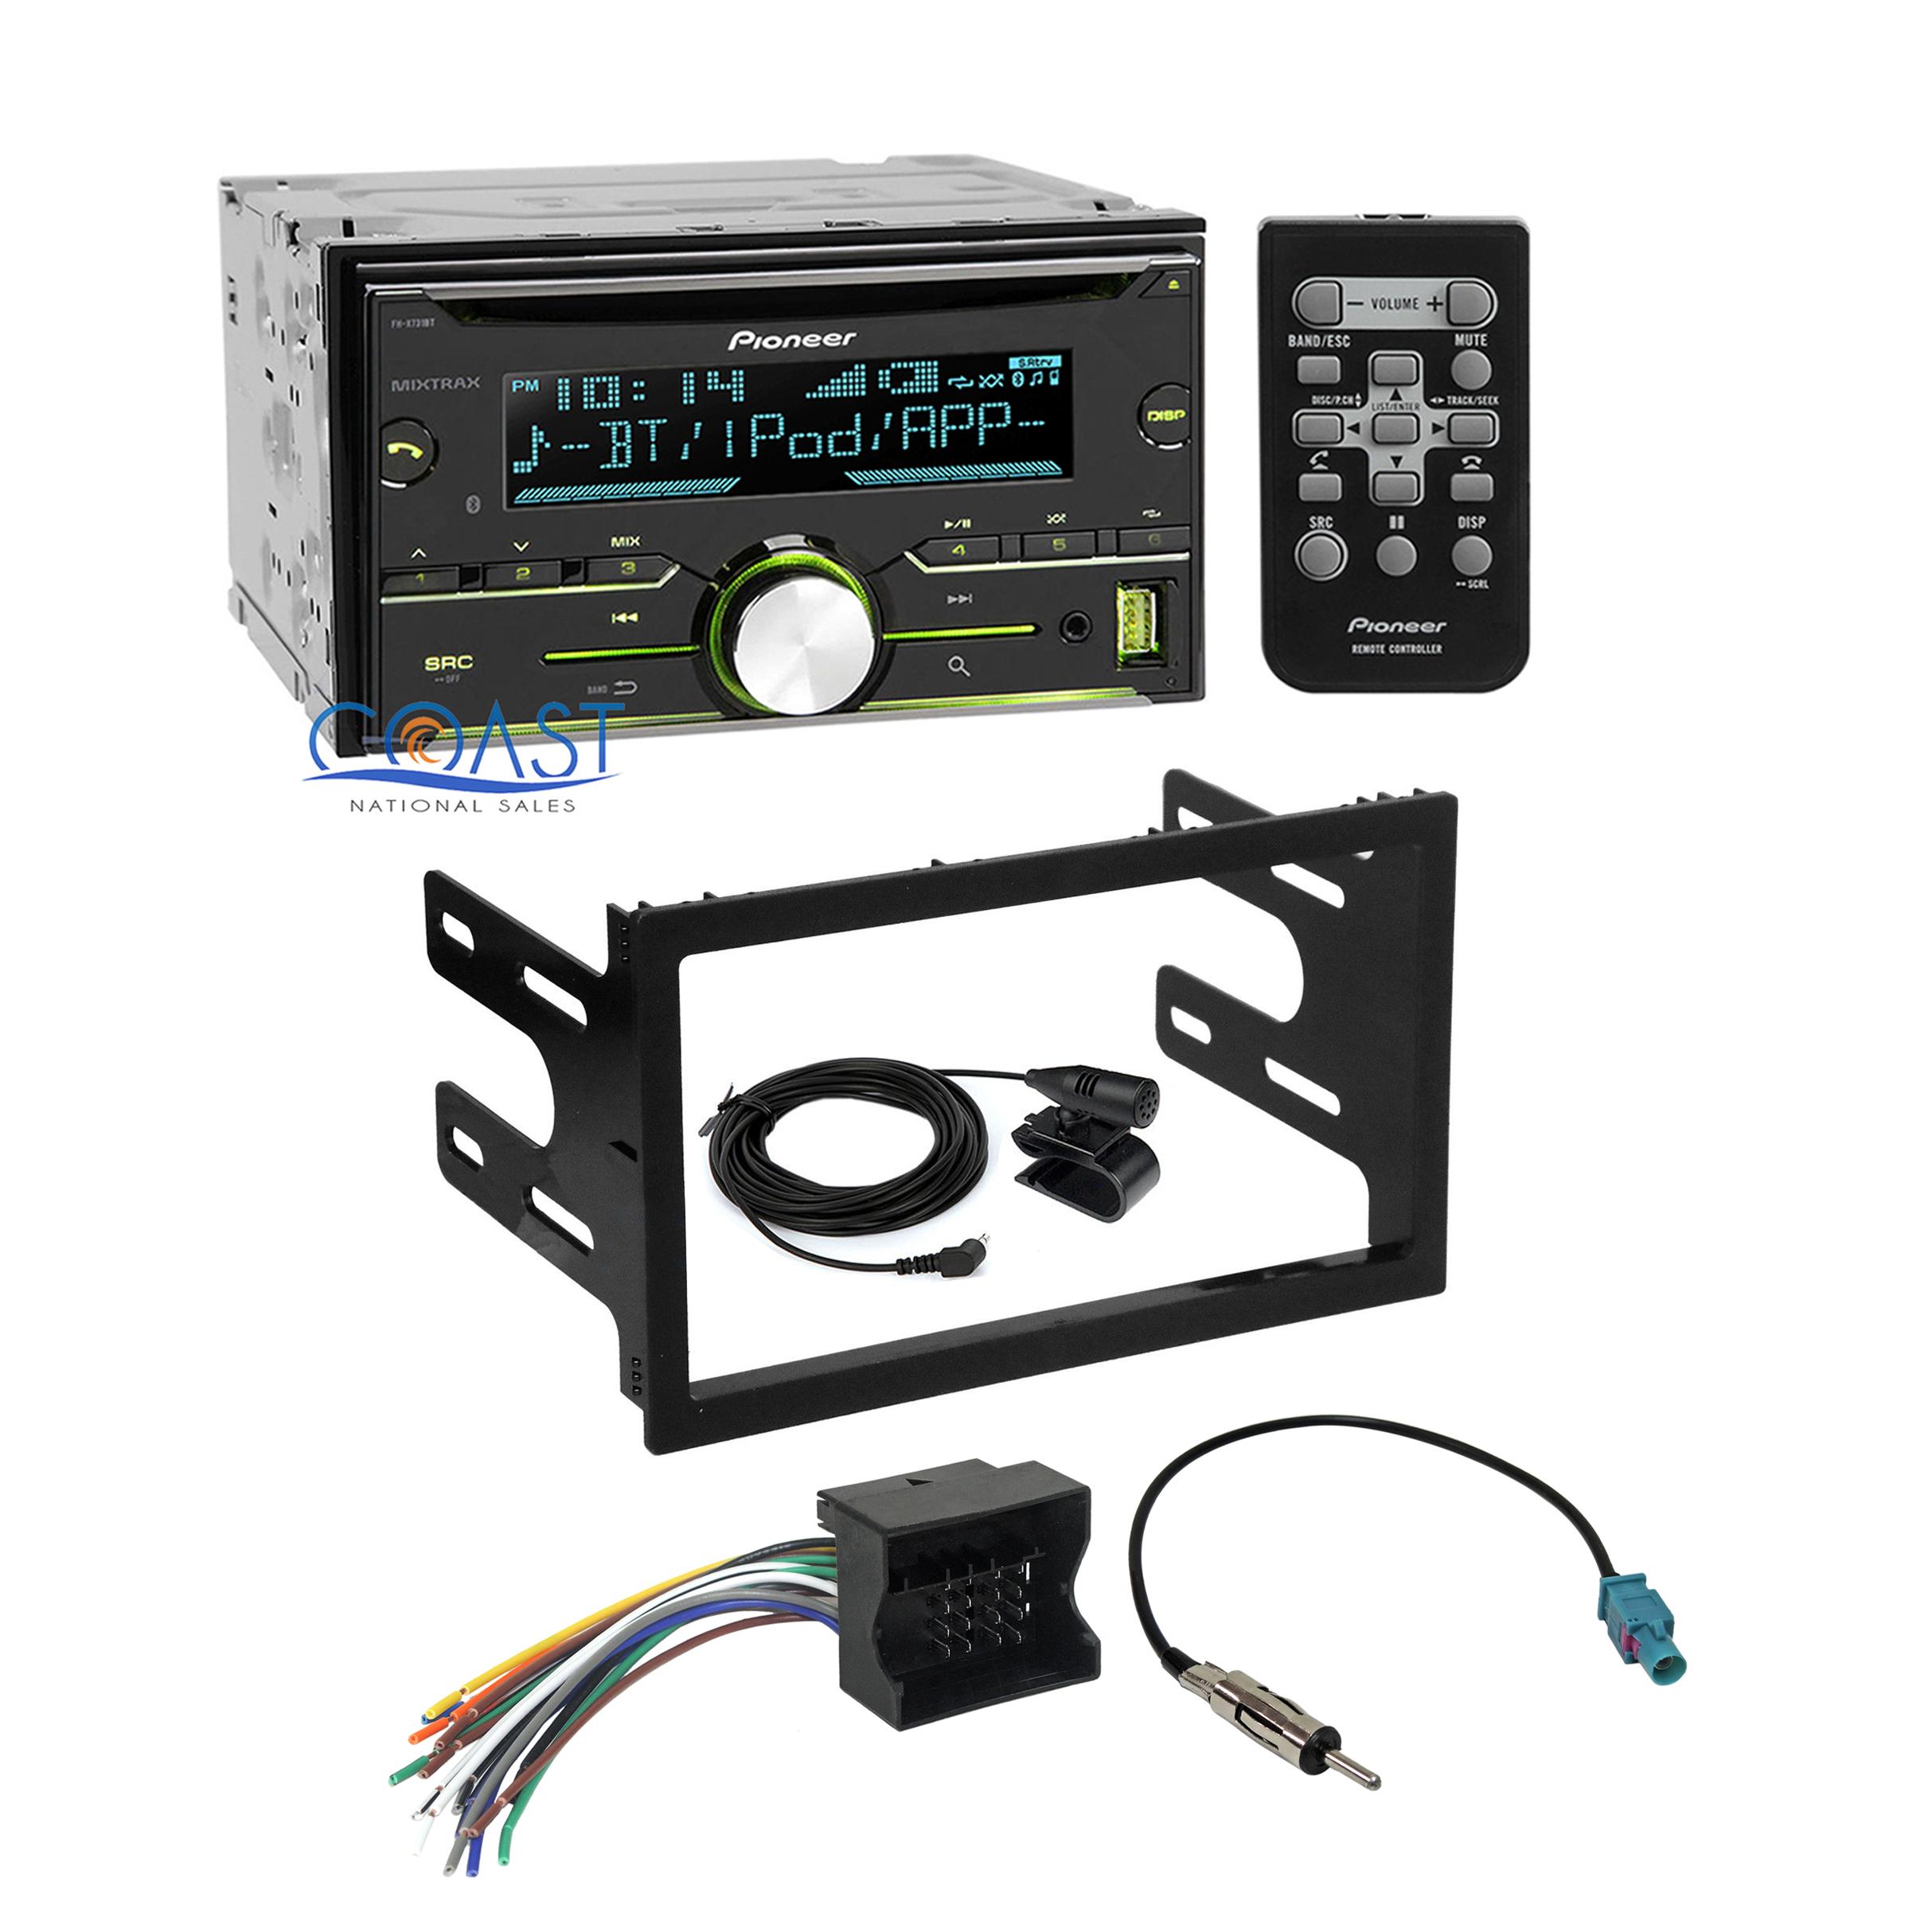 Jetta Radio Wiring Harness : Pioneer car radio stereo dash kit wire harness for